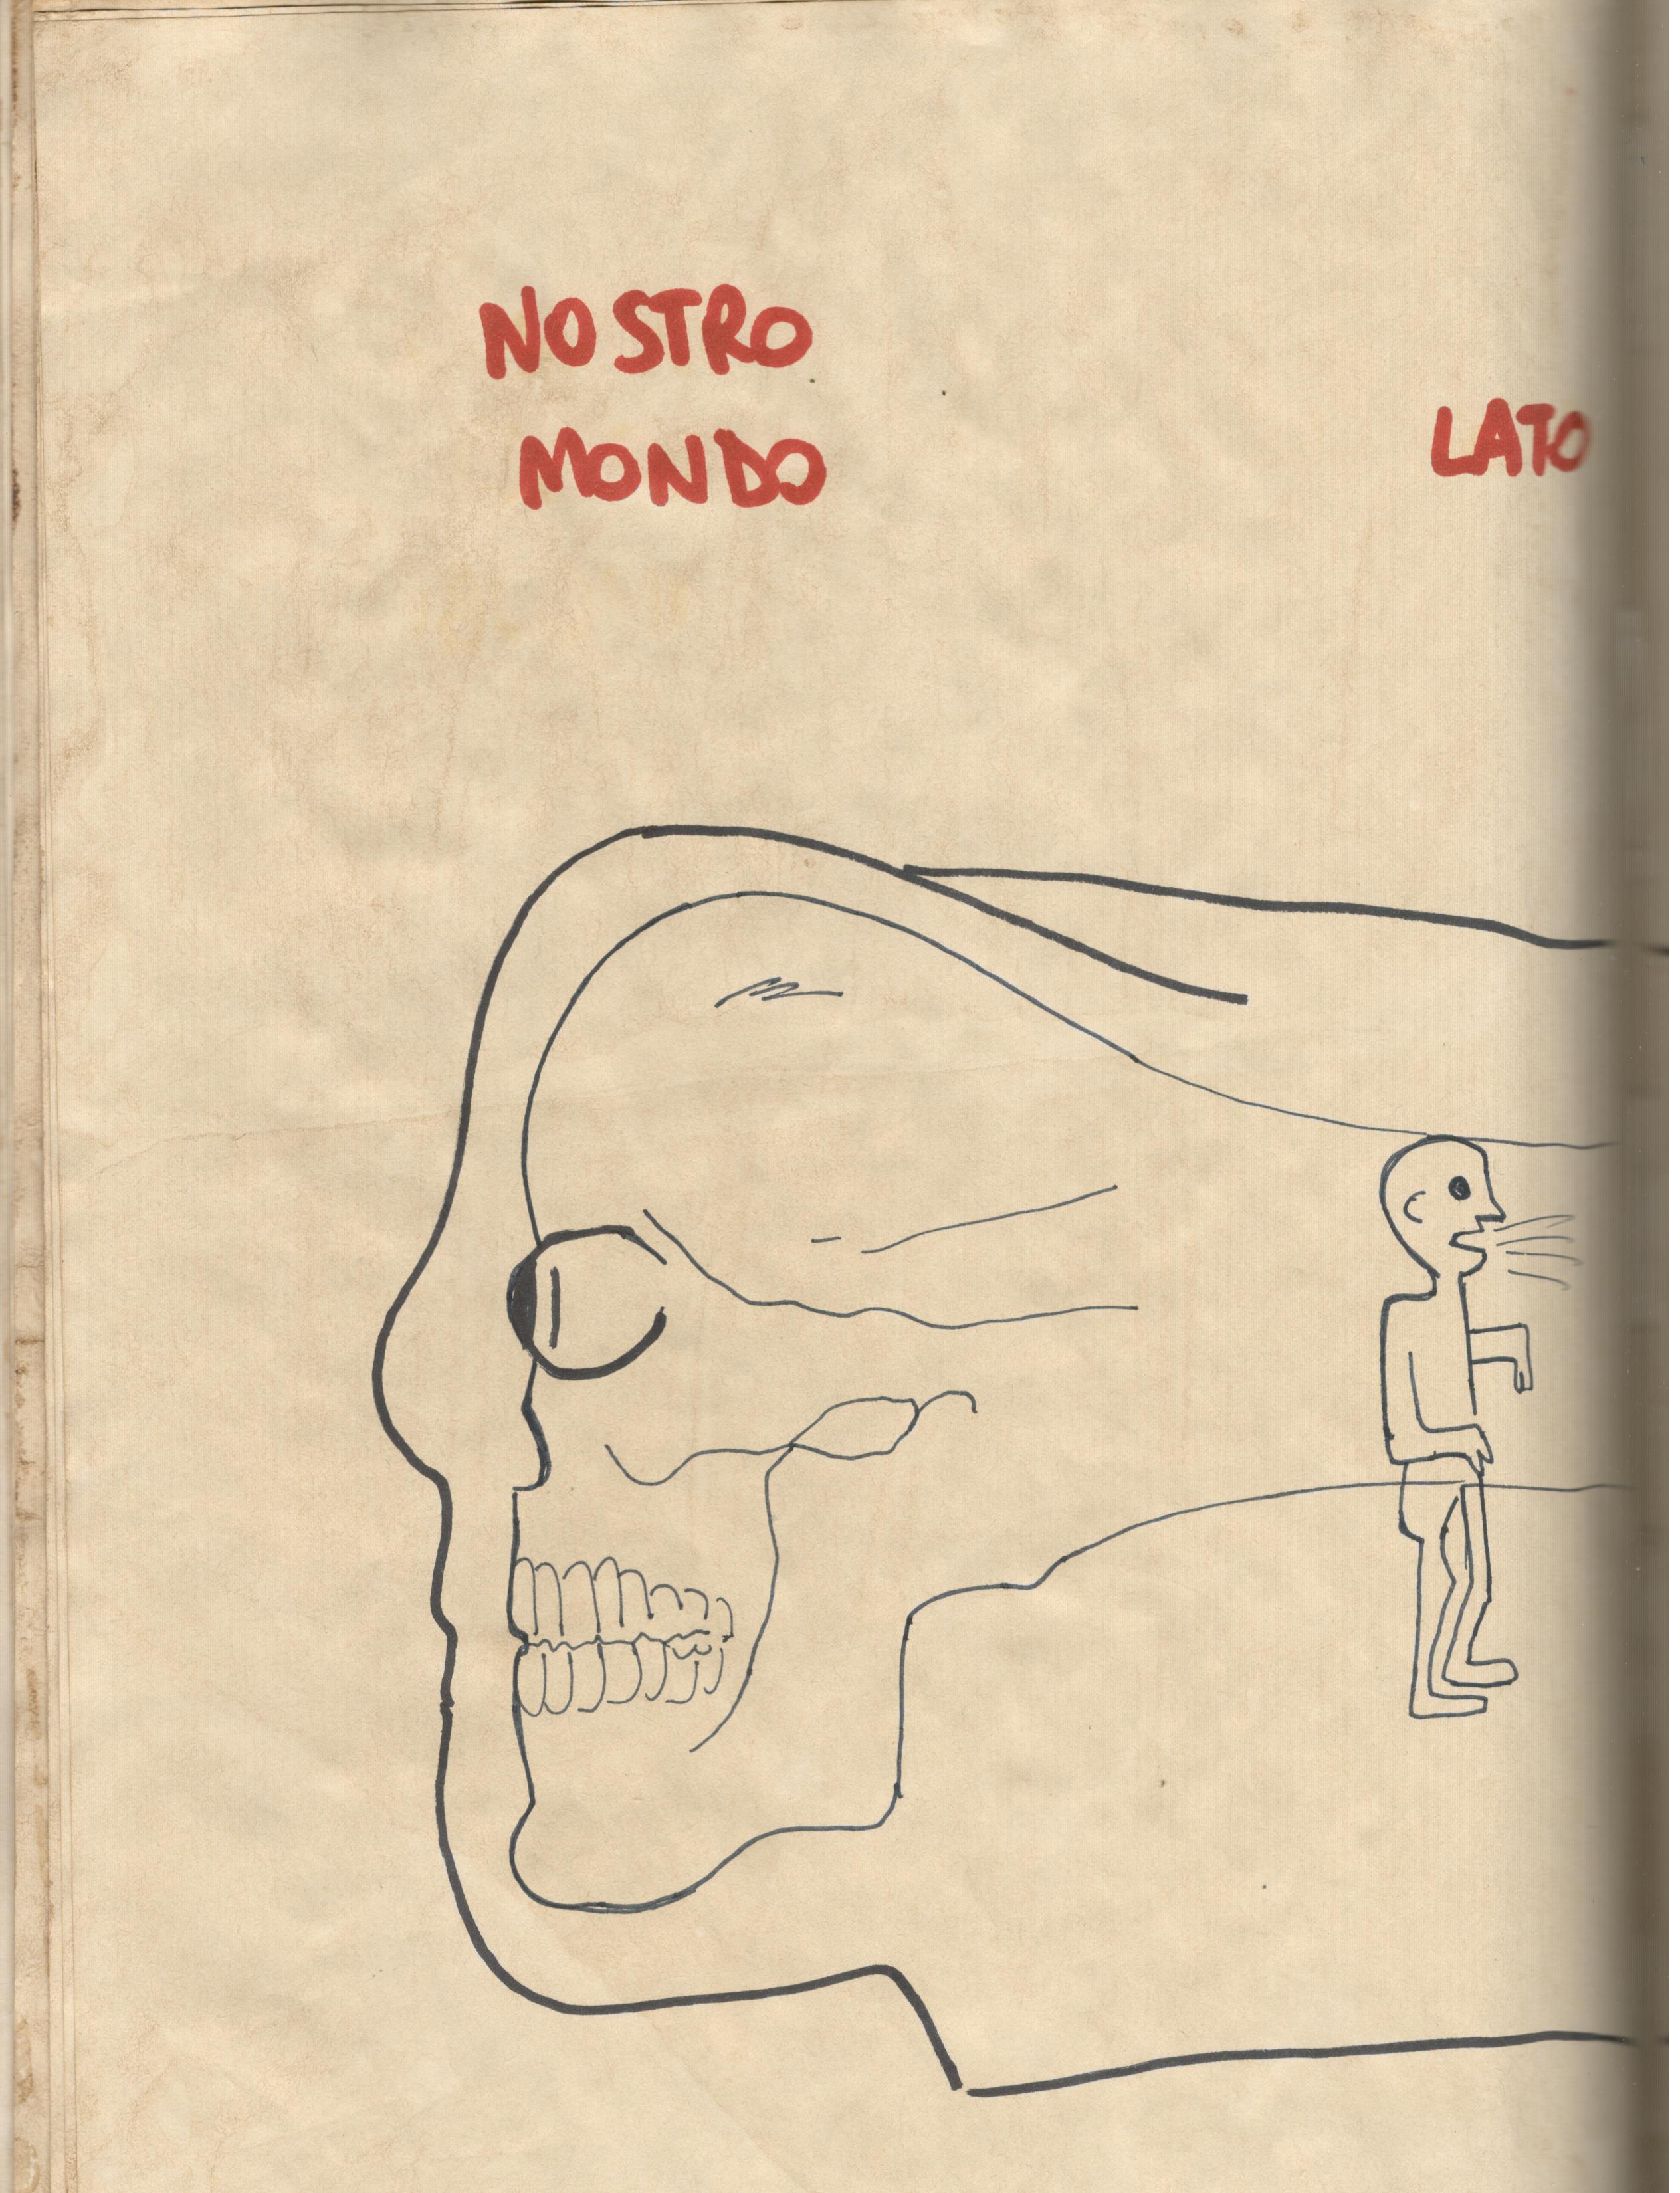 Diario_03_Gravity_Falls_Meschia_2019_-66